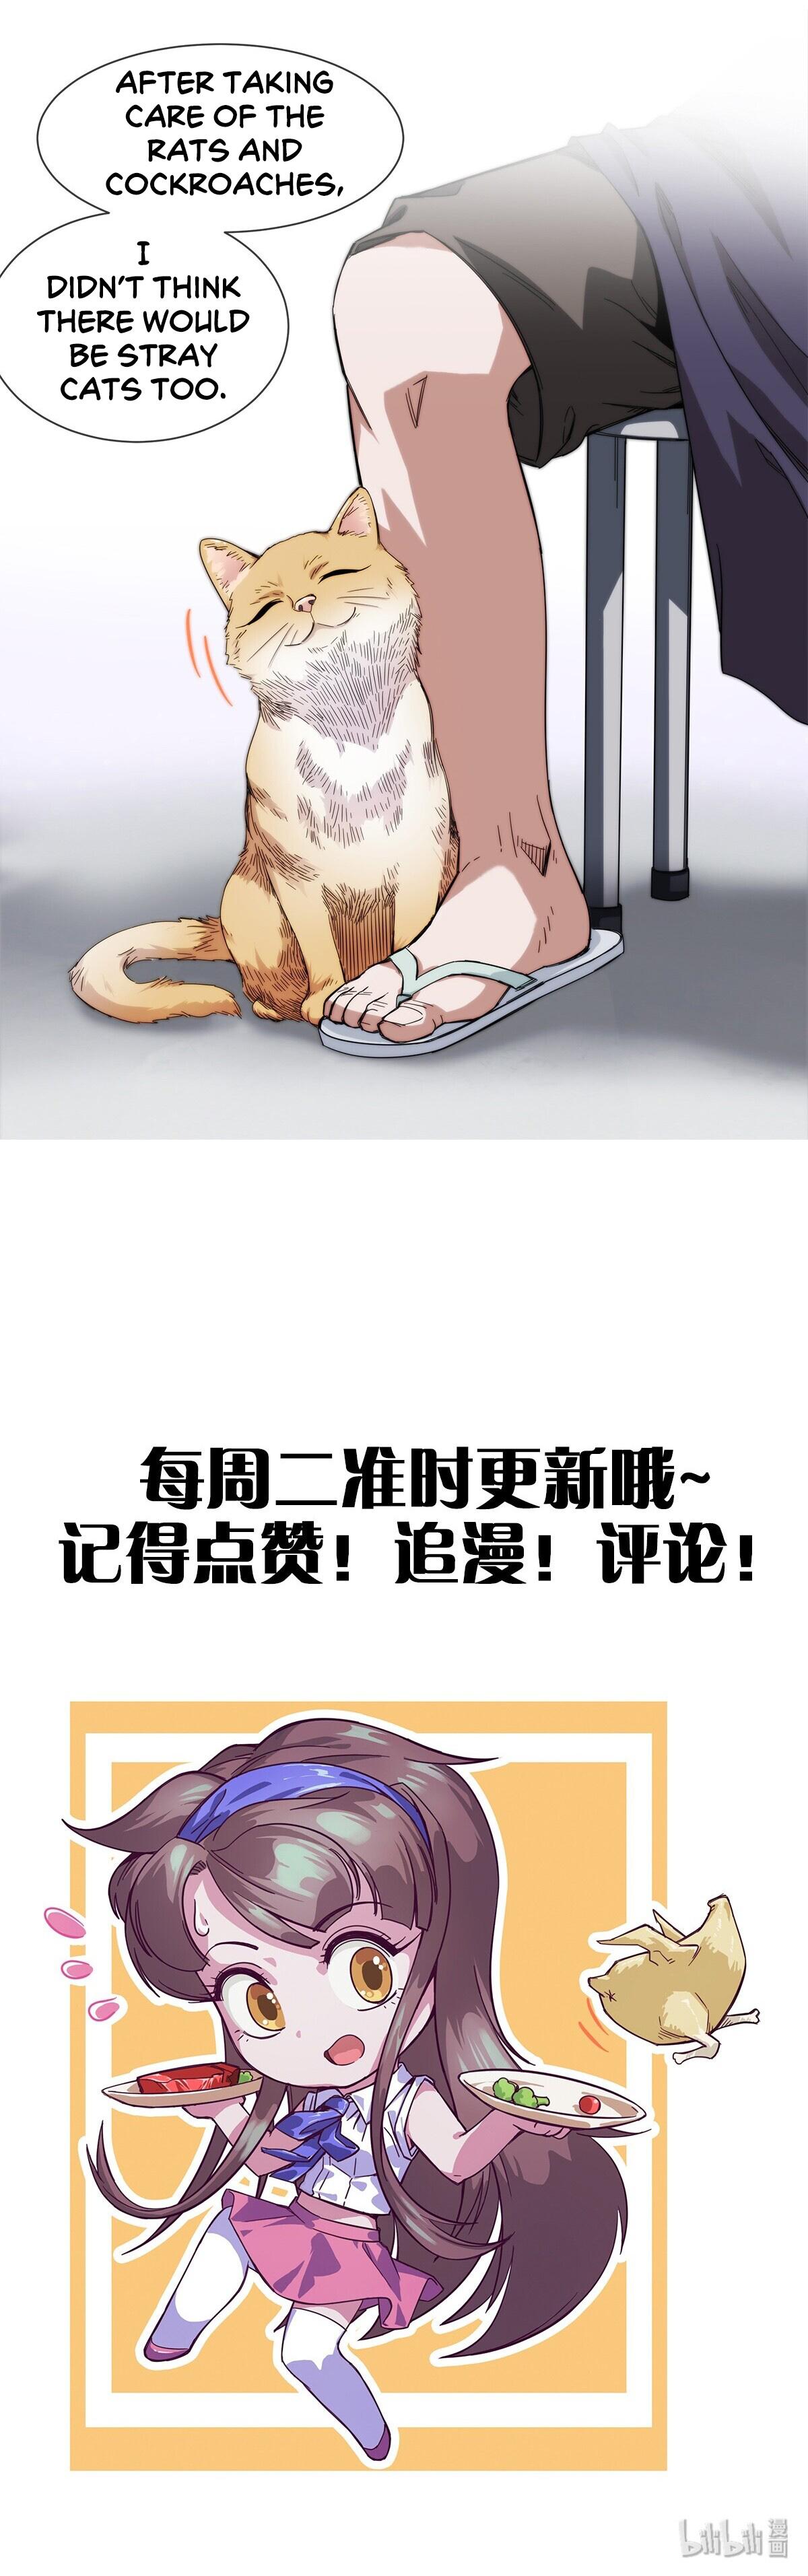 Handyman Saitou In Another World Chapter 17 page 13 - Mangakakalots.com